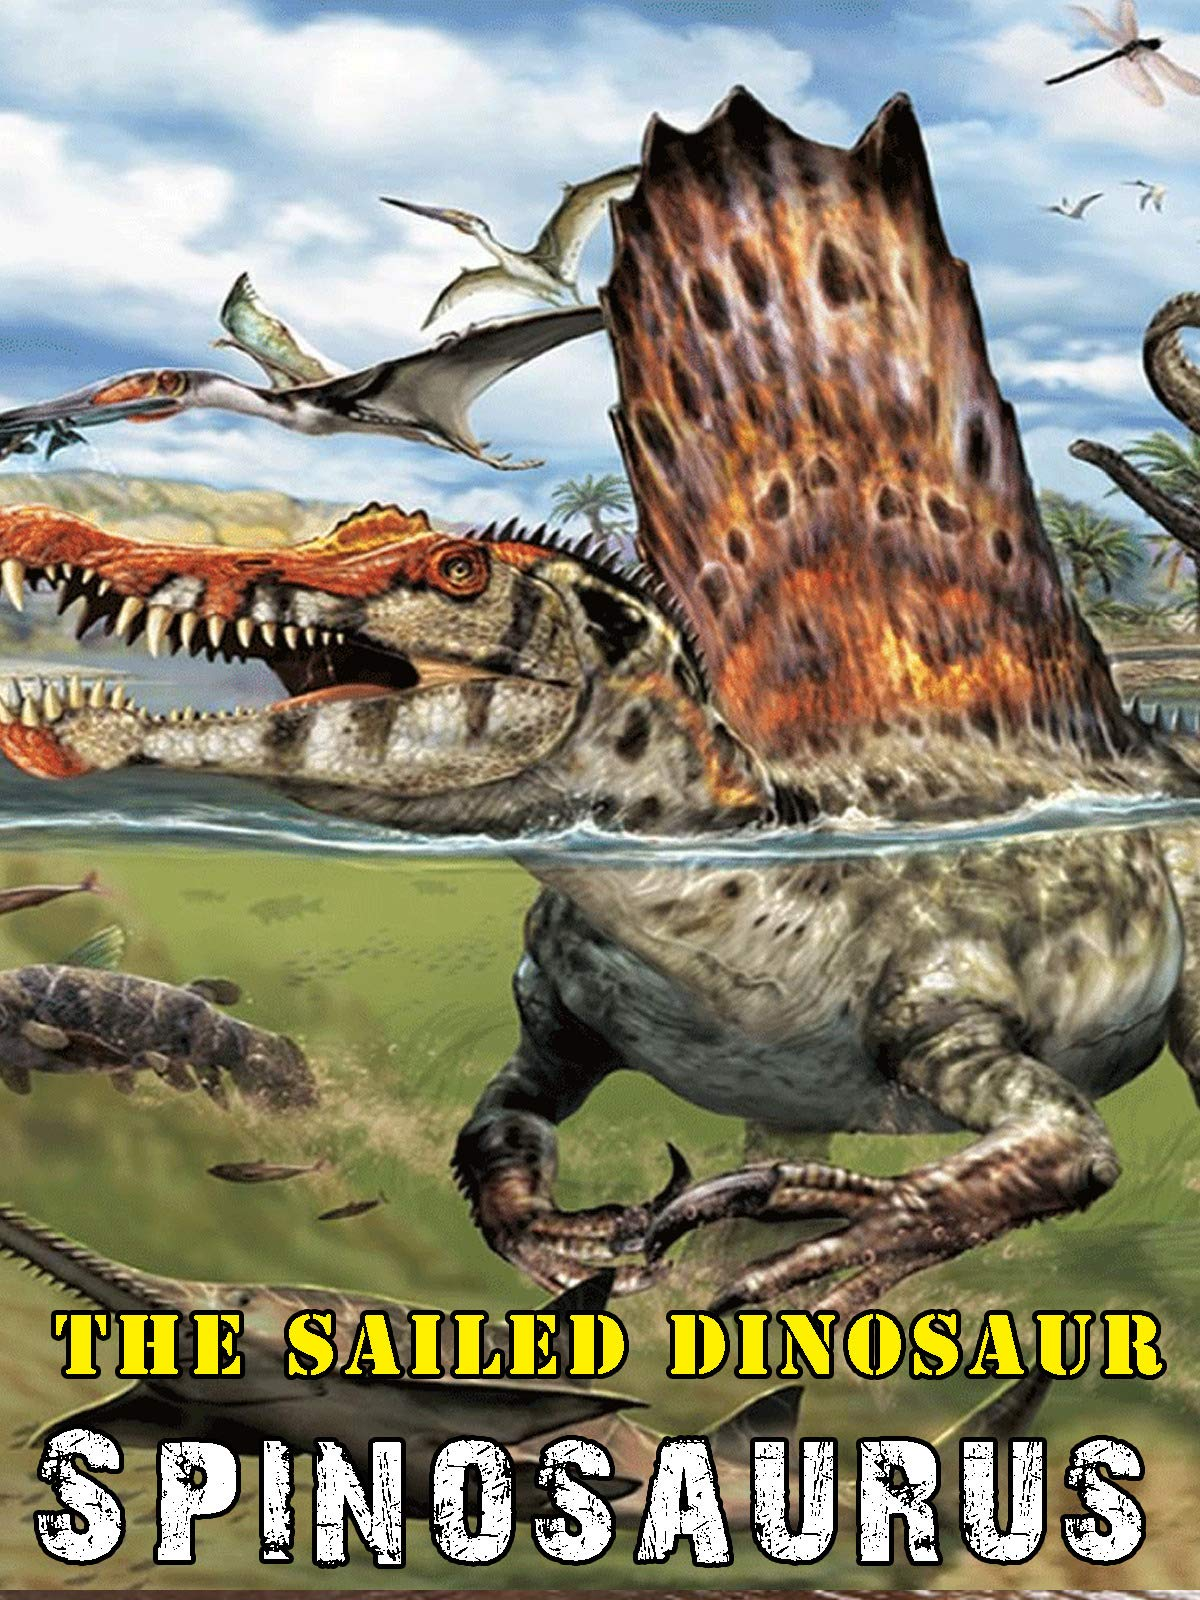 The Sailed Dinosaur: Spinosaurus